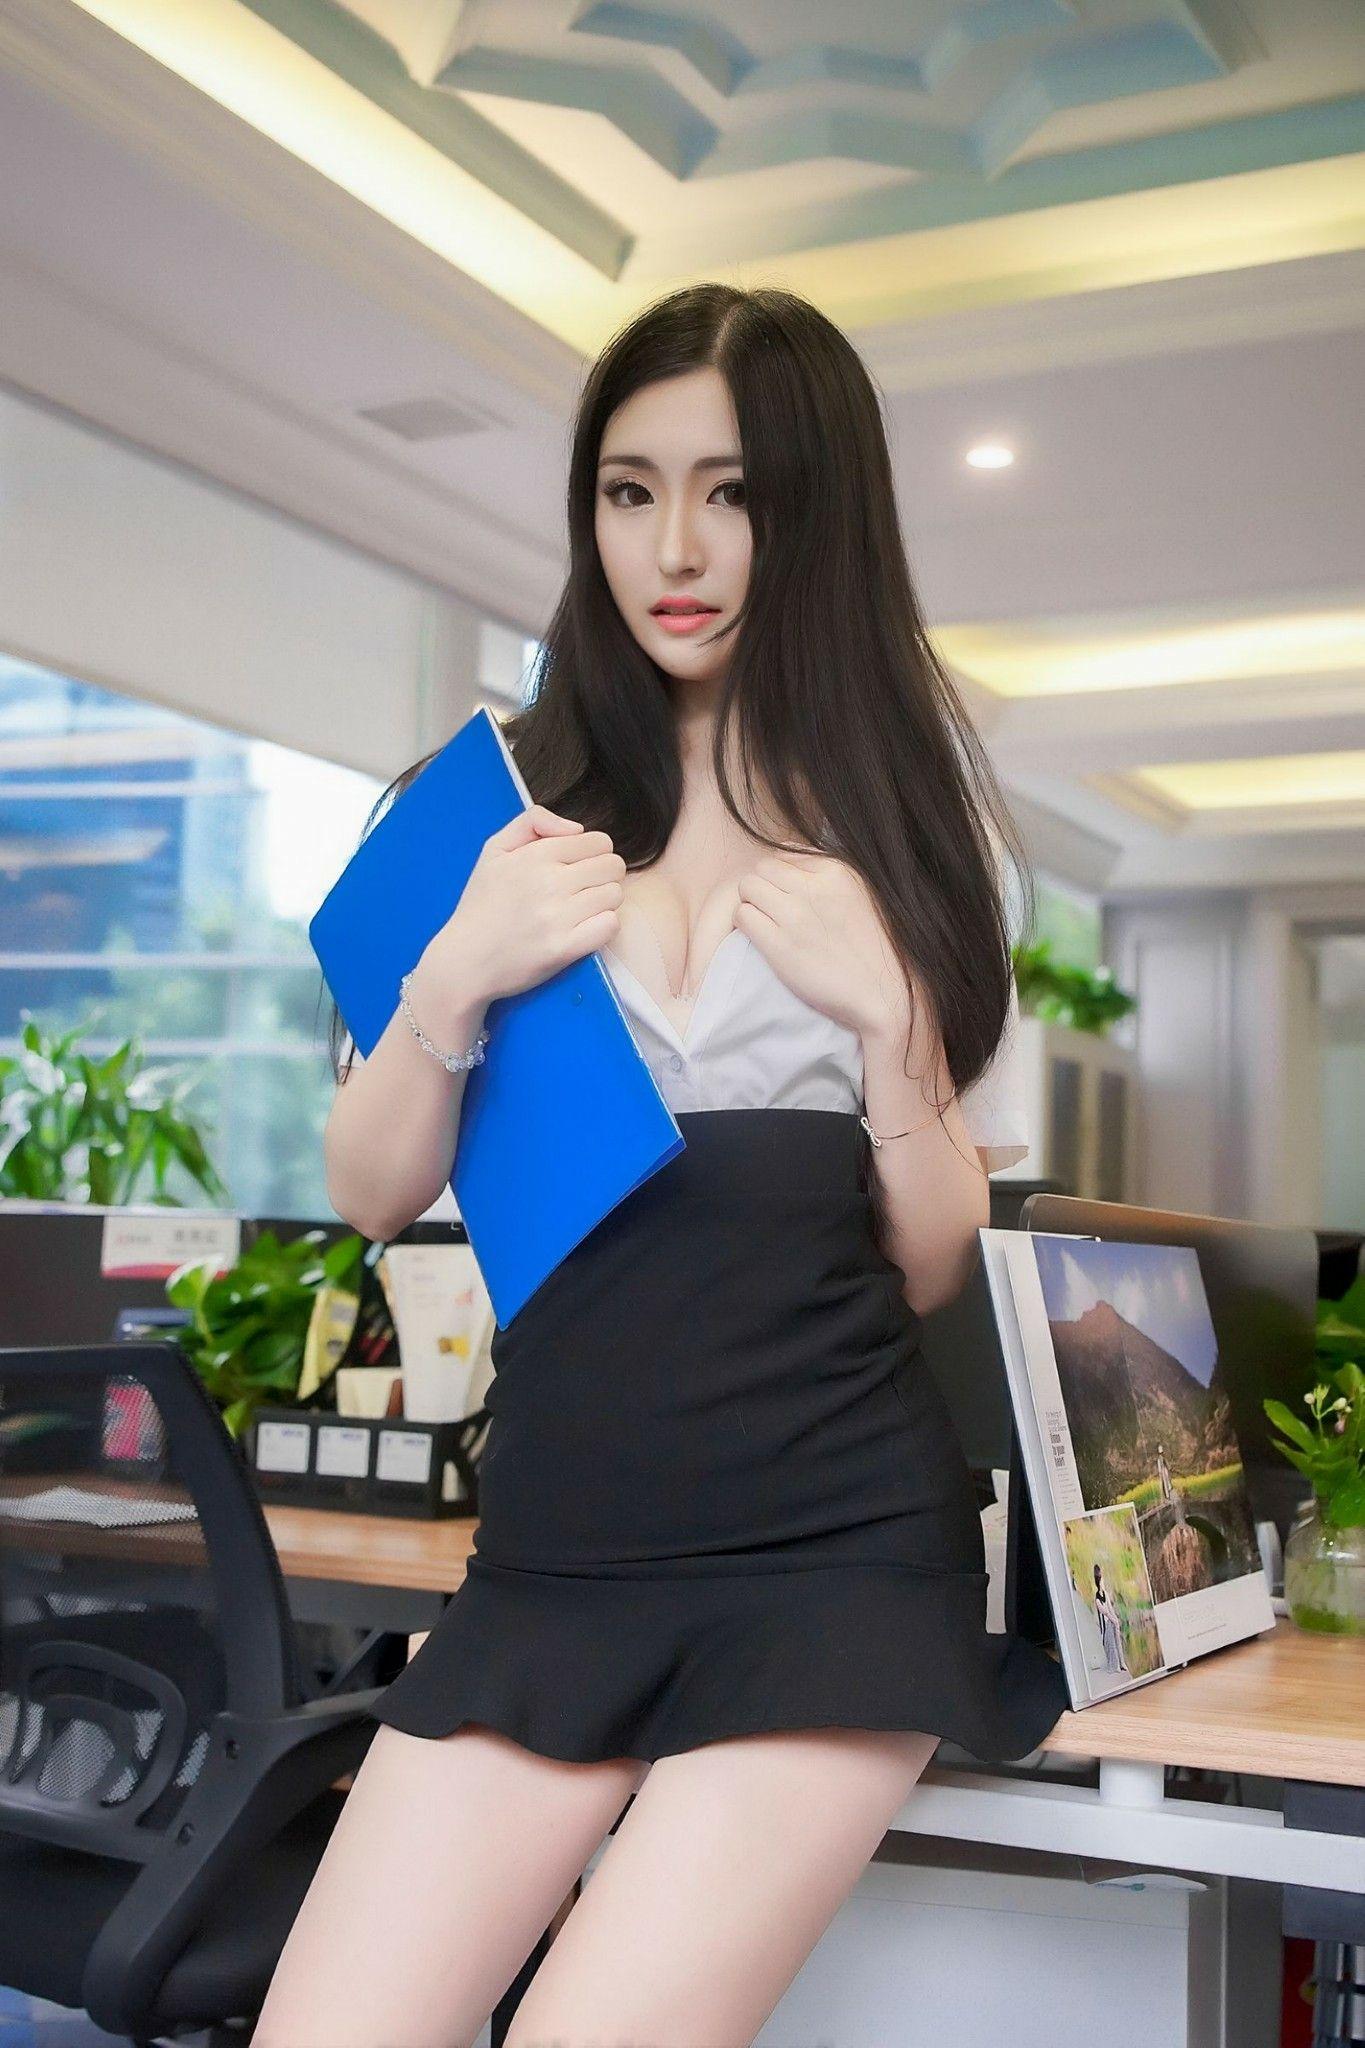 Puffy filipina nipples